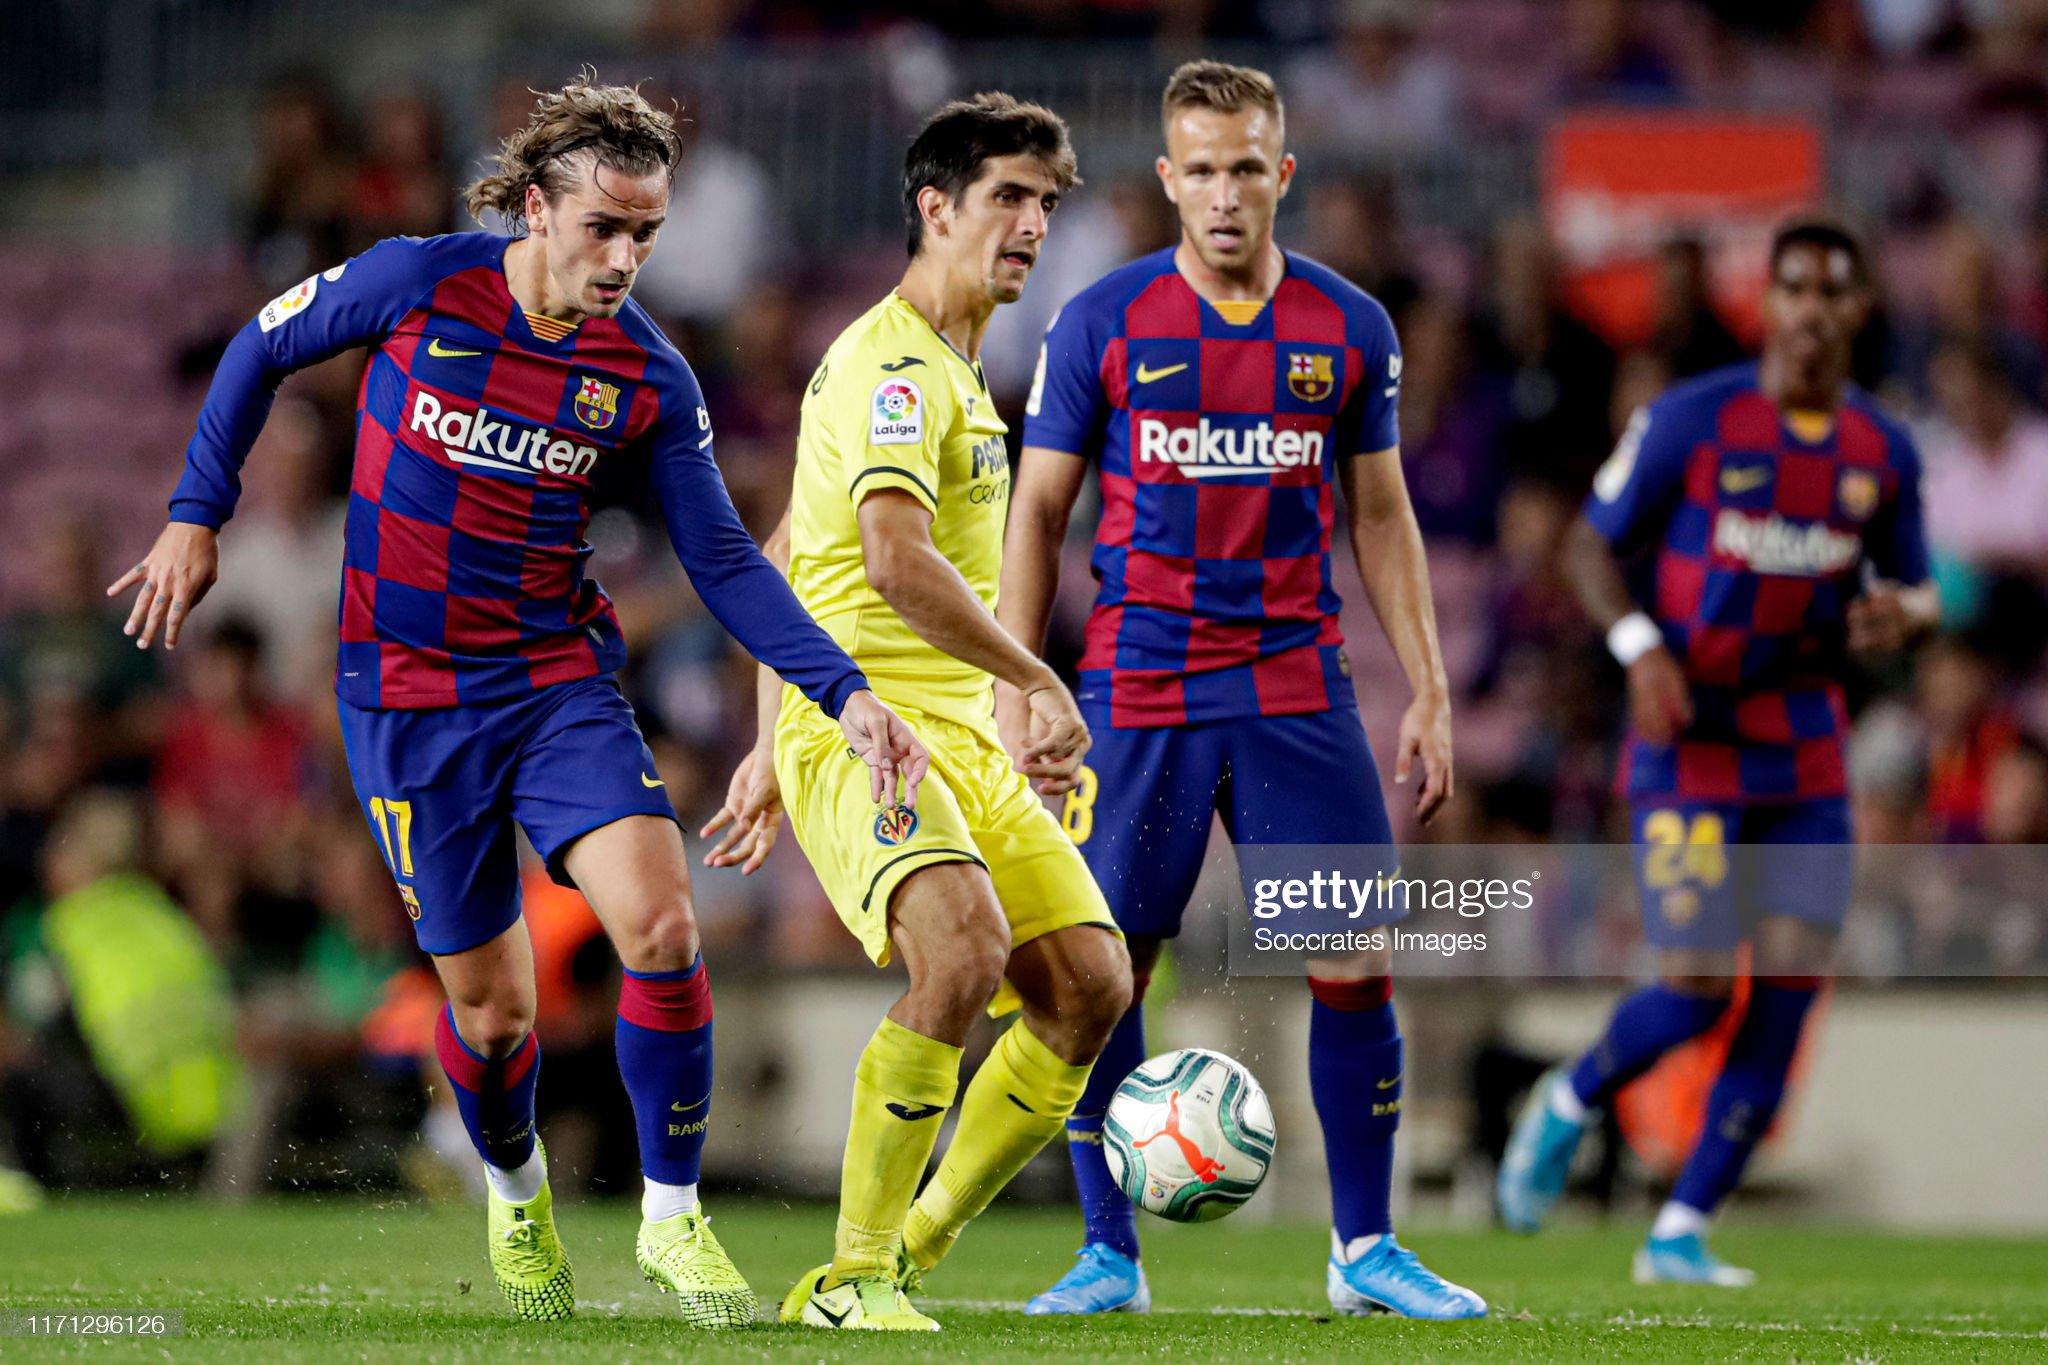 صور مباراة : برشلونة - فياريال 2-1 ( 24-09-2019 )  Antoine-griezmann-of-fc-barcelona-gerard-moreno-of-villarreal-during-picture-id1171296126?s=2048x2048